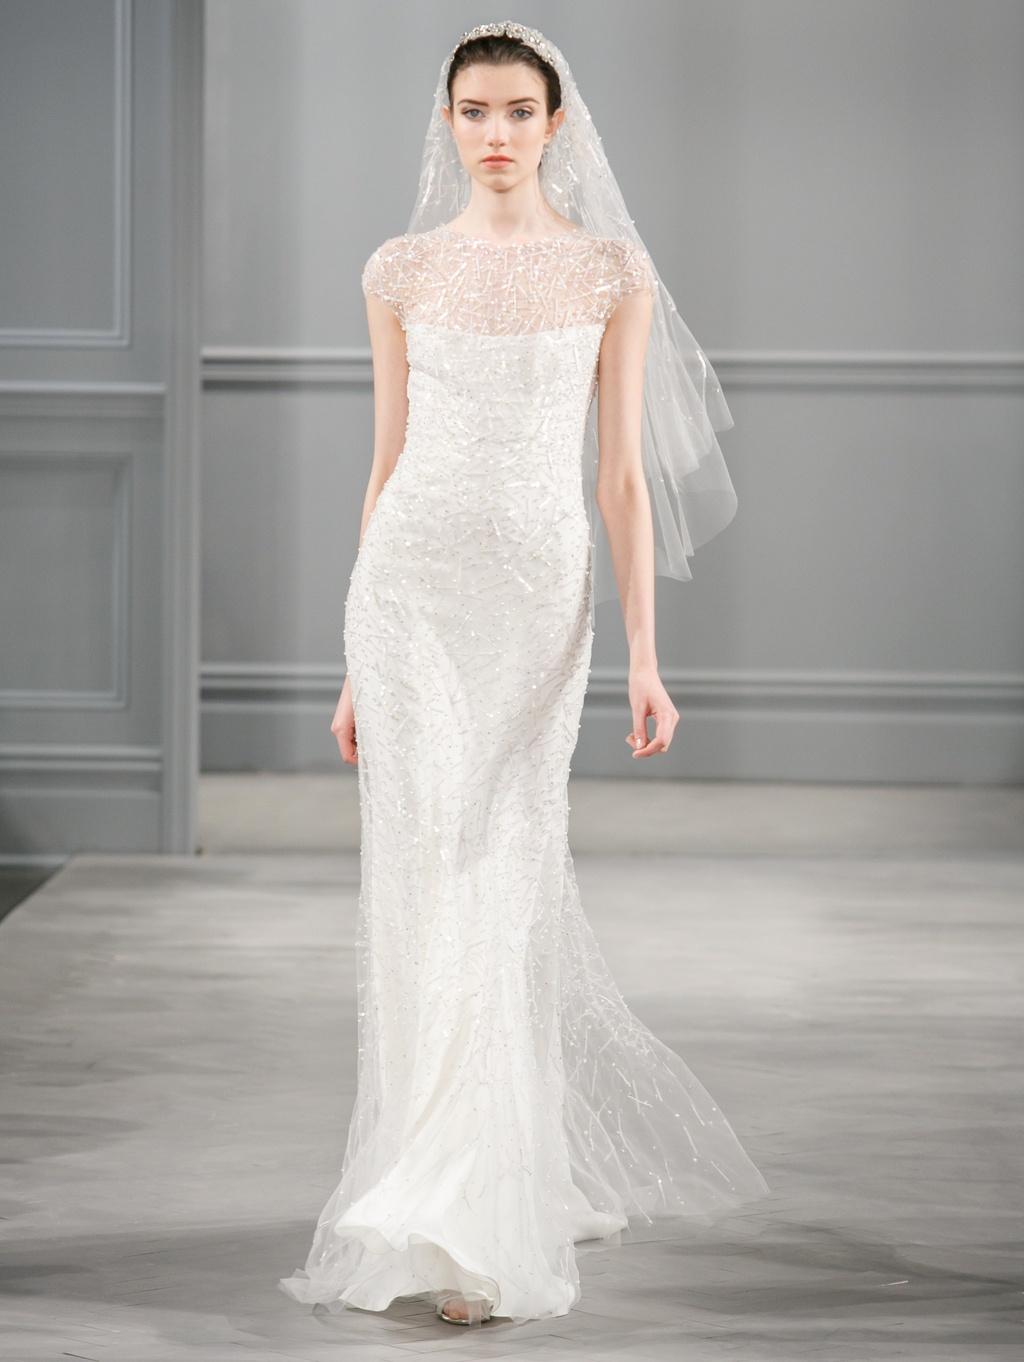 Spring-2014-wedding-dress-monique-lhuillier-bridal-celestial-2.full